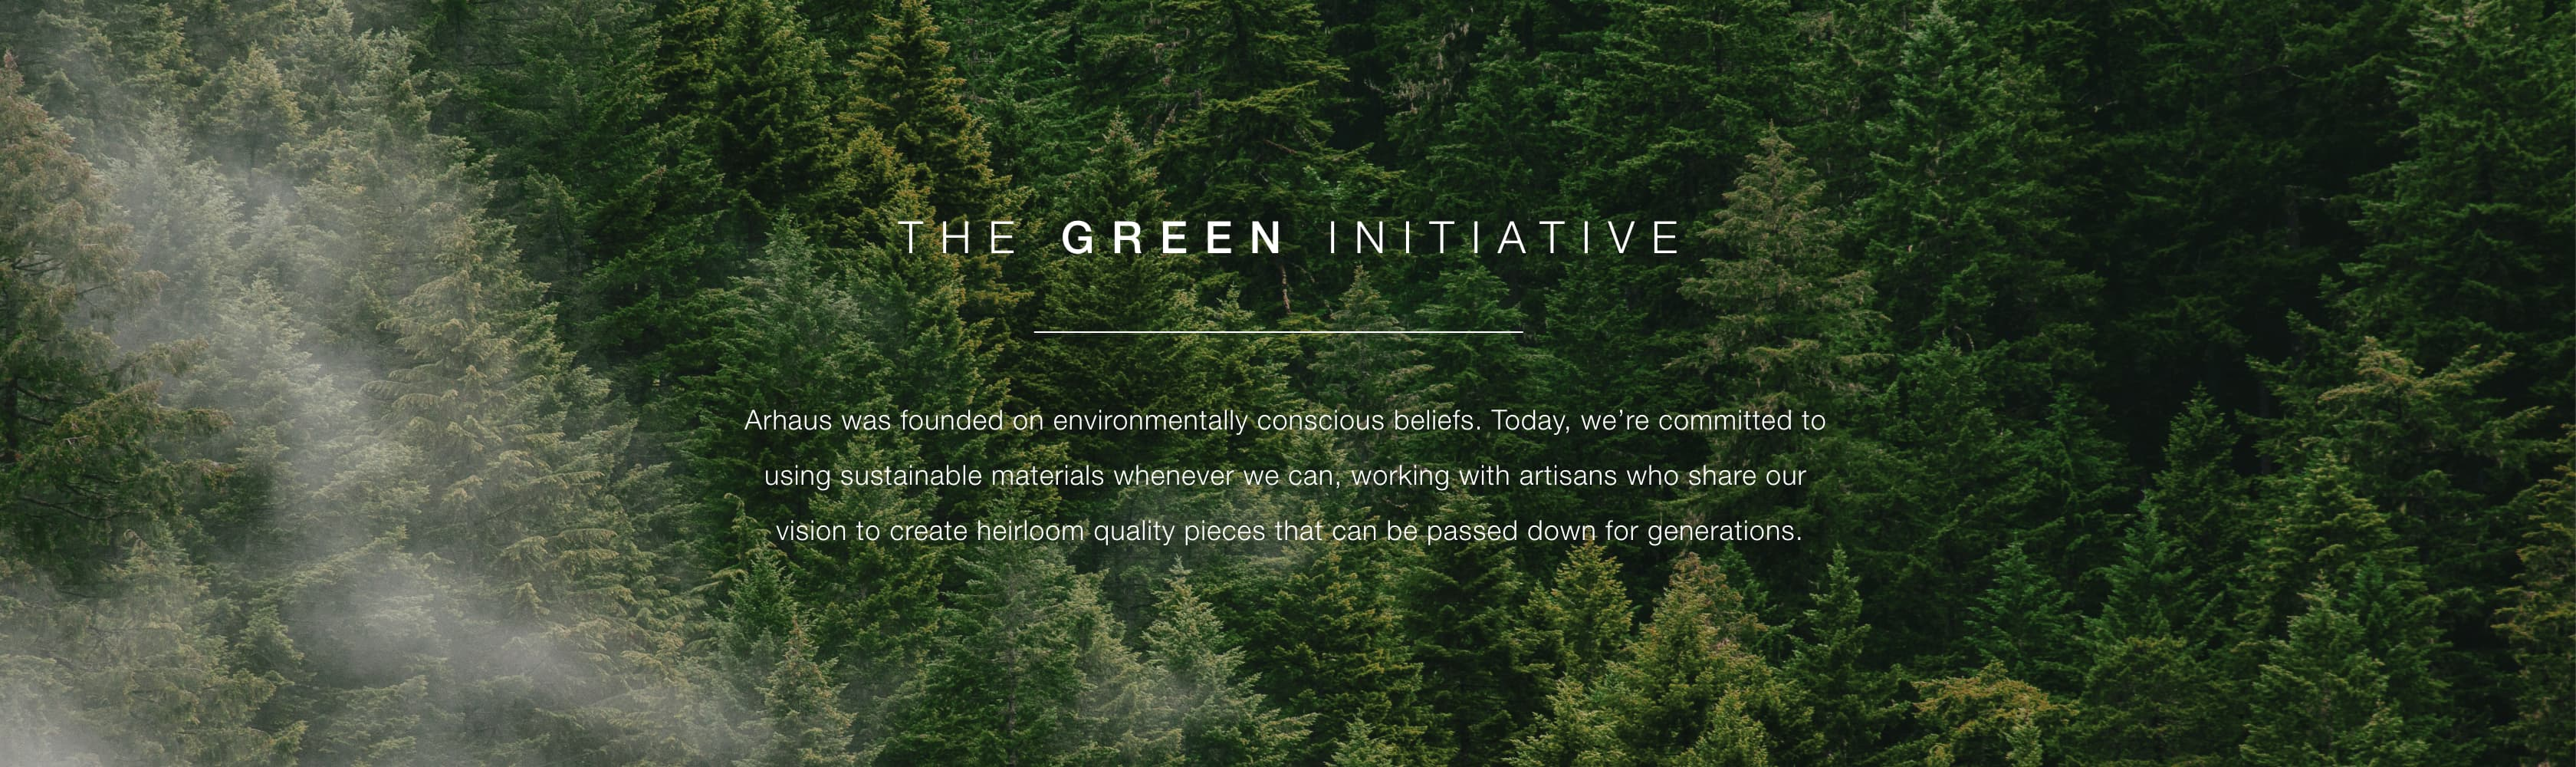 The Arhaus Green Initiative